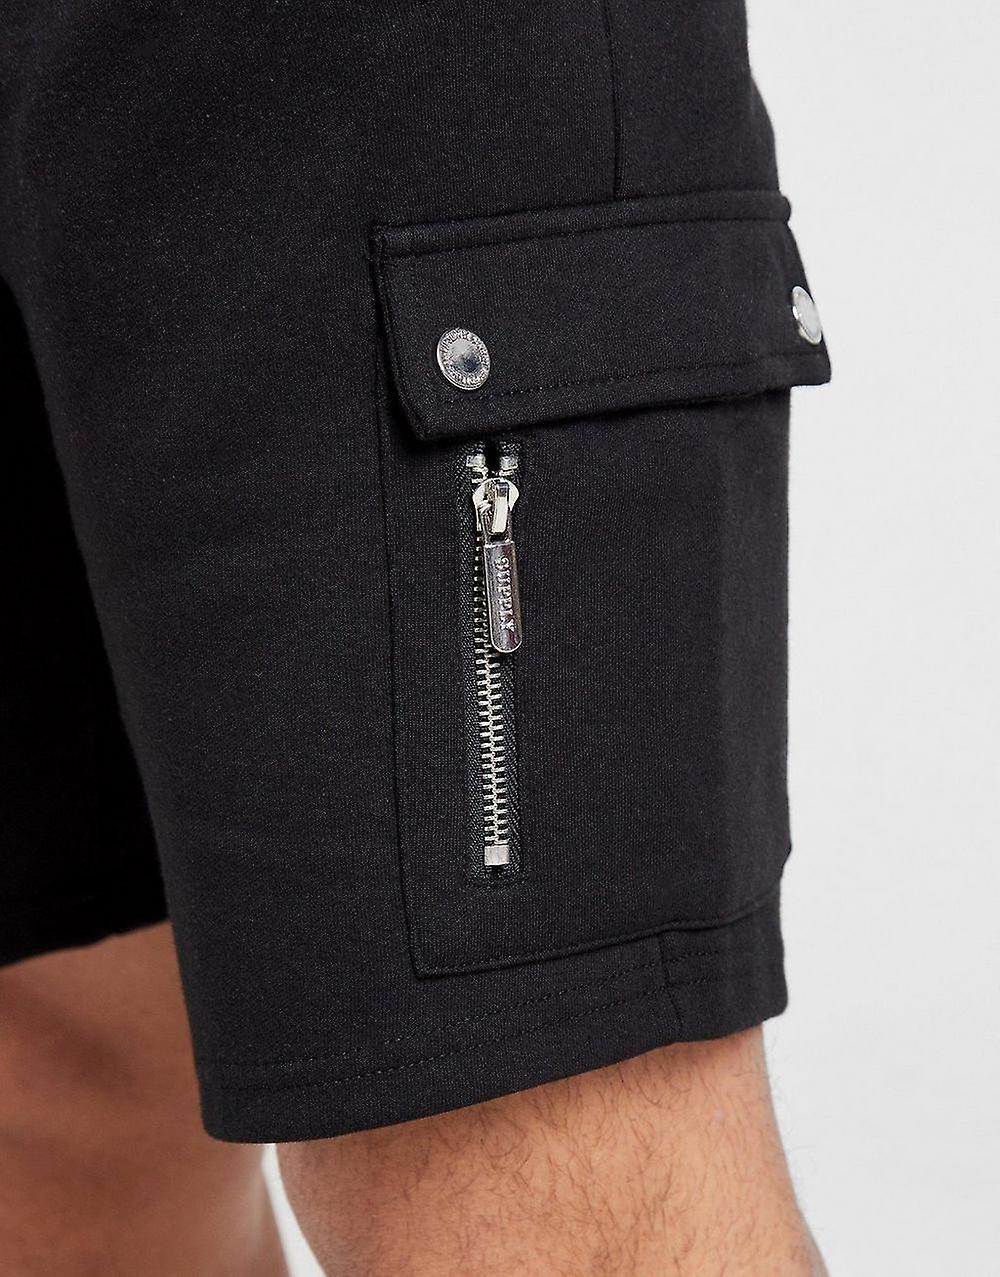 New Supply & Demand Men's Military Shorts Black XOfnAc